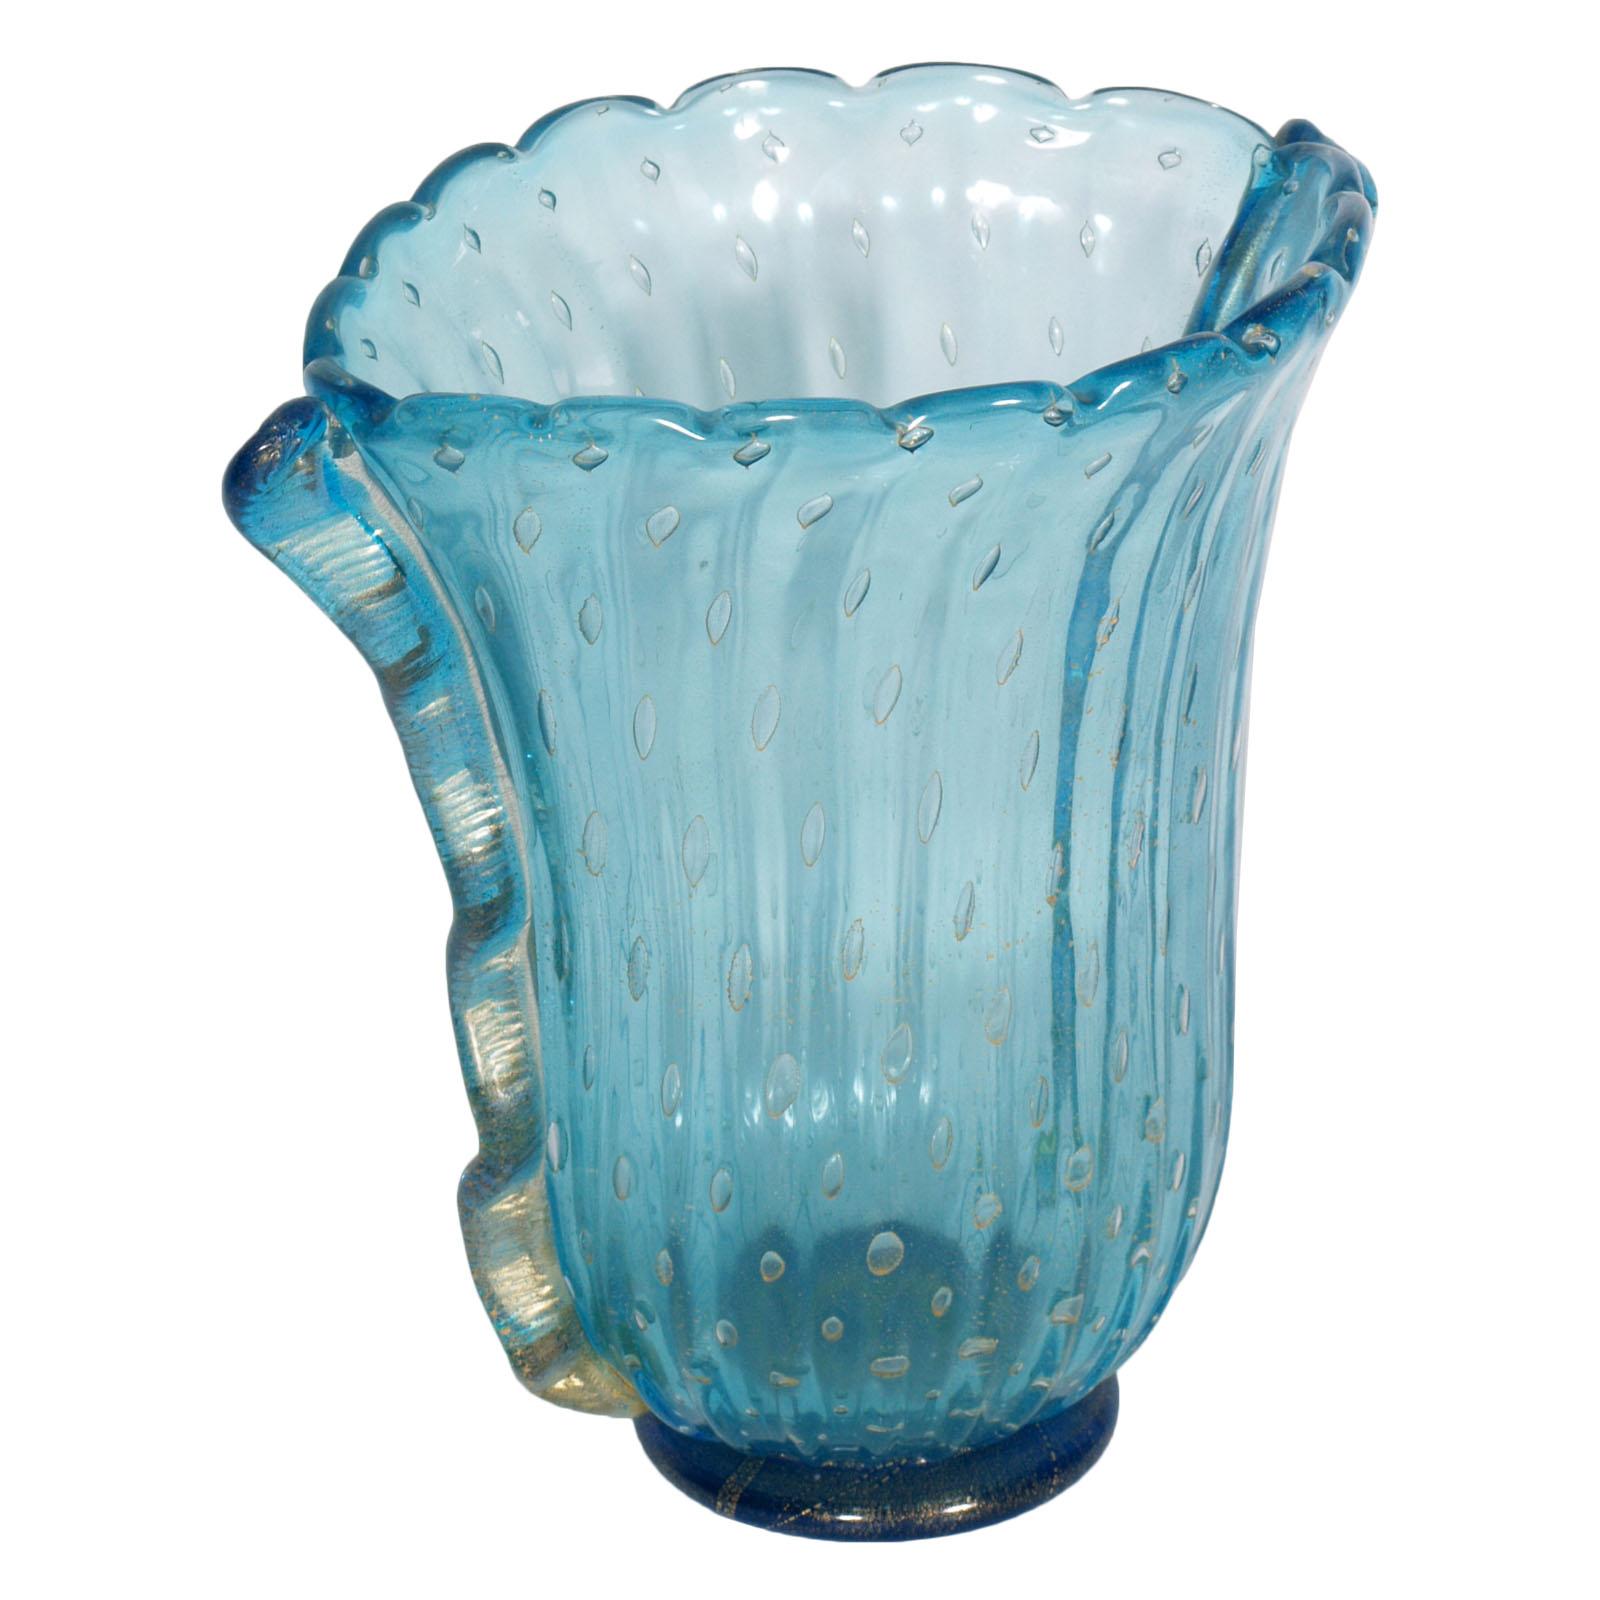 Barovier toso murano glass vaso art deco vase signed for Barovier e toso